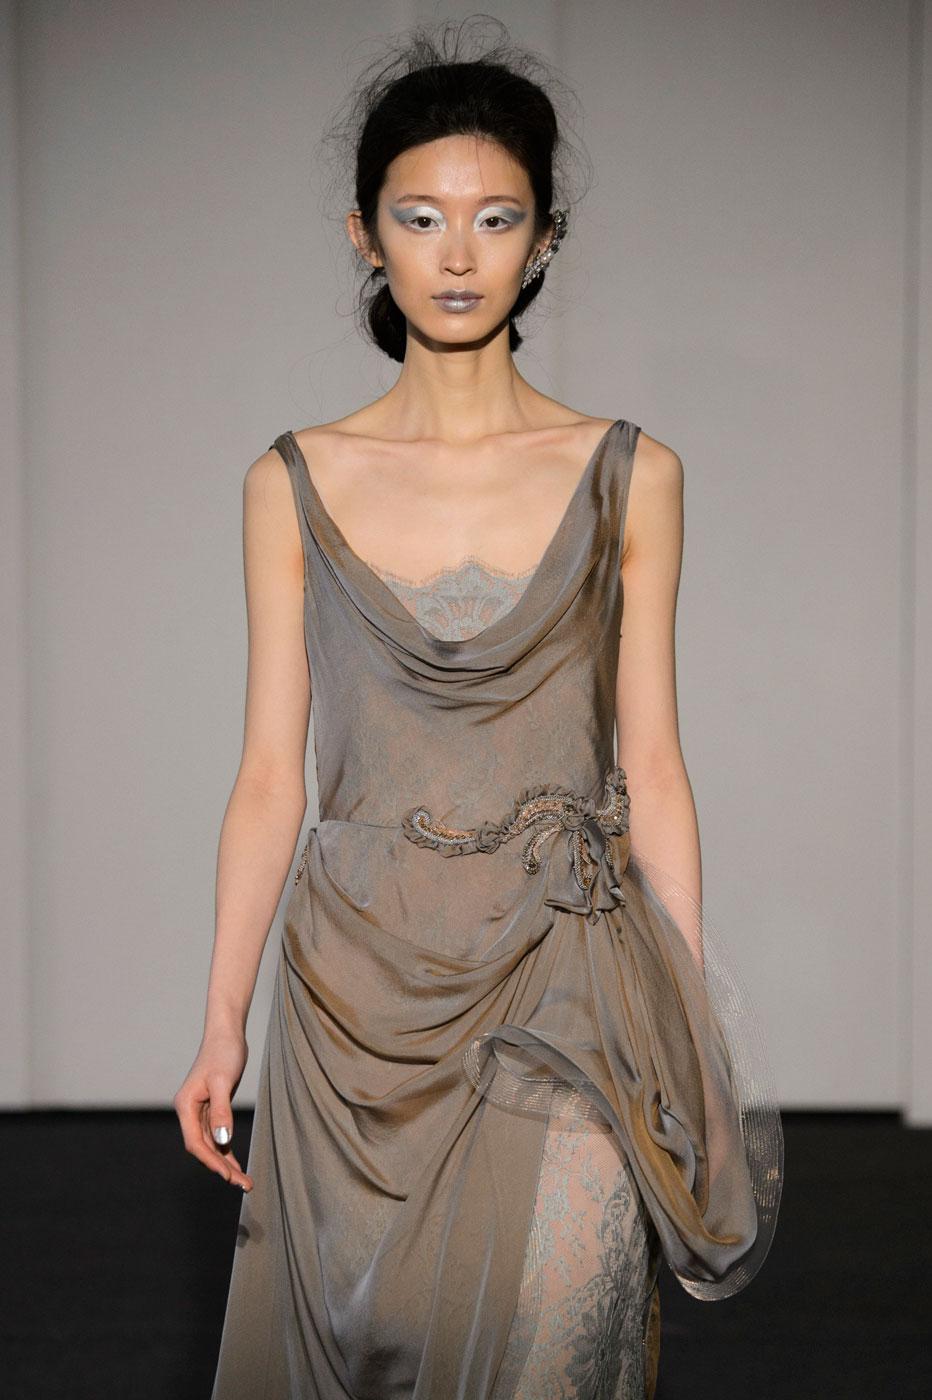 Busardi-fashion-runway-show-haute-couture-paris-spring-2015-the-impression-23